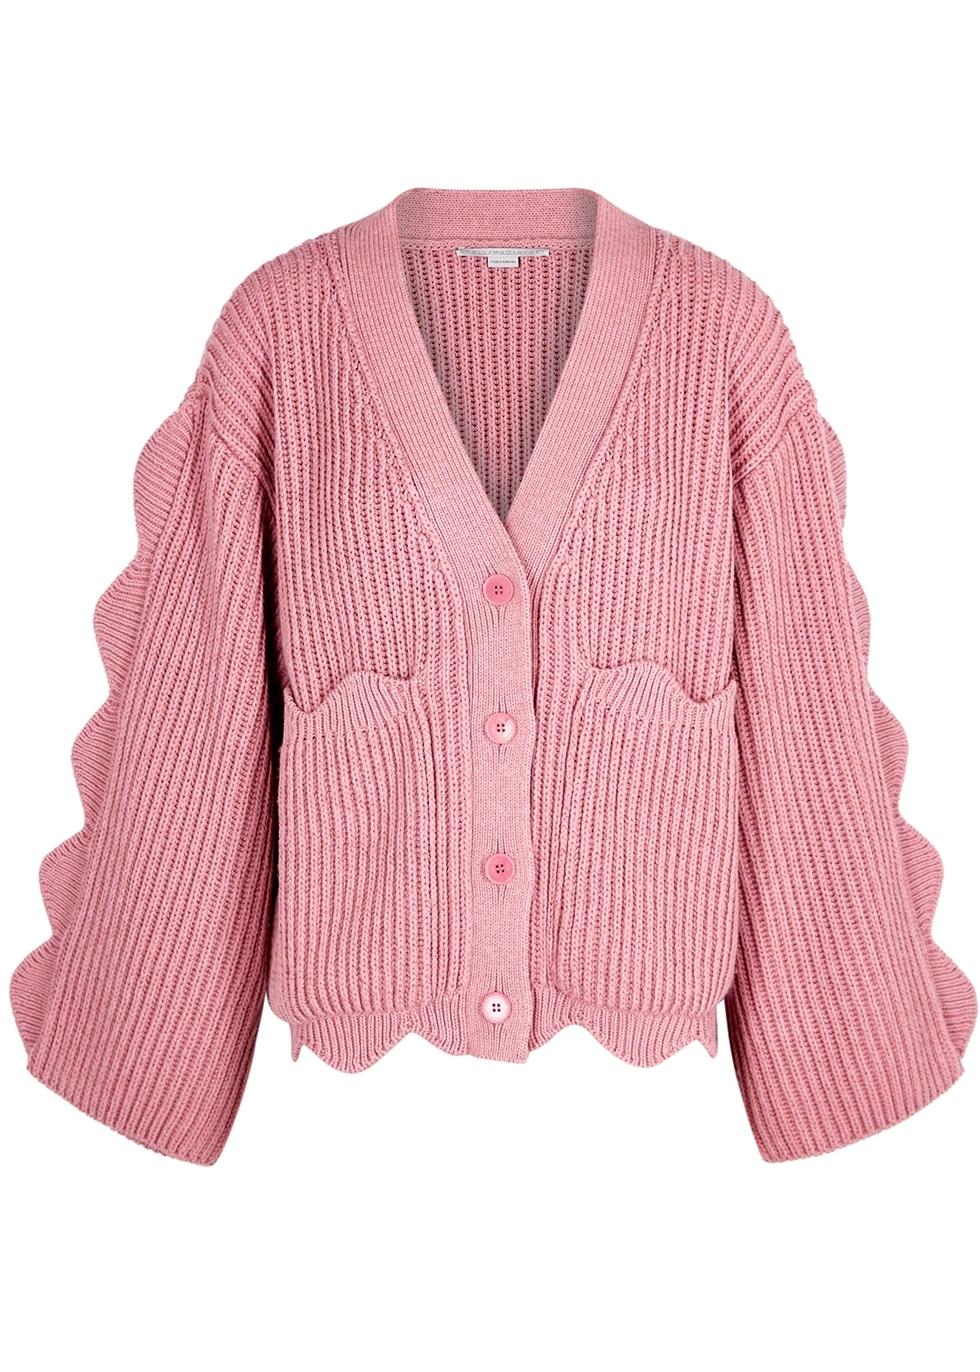 1b976aee62f6 Women s Designer Knitwear and Jumpers - Harvey Nichols